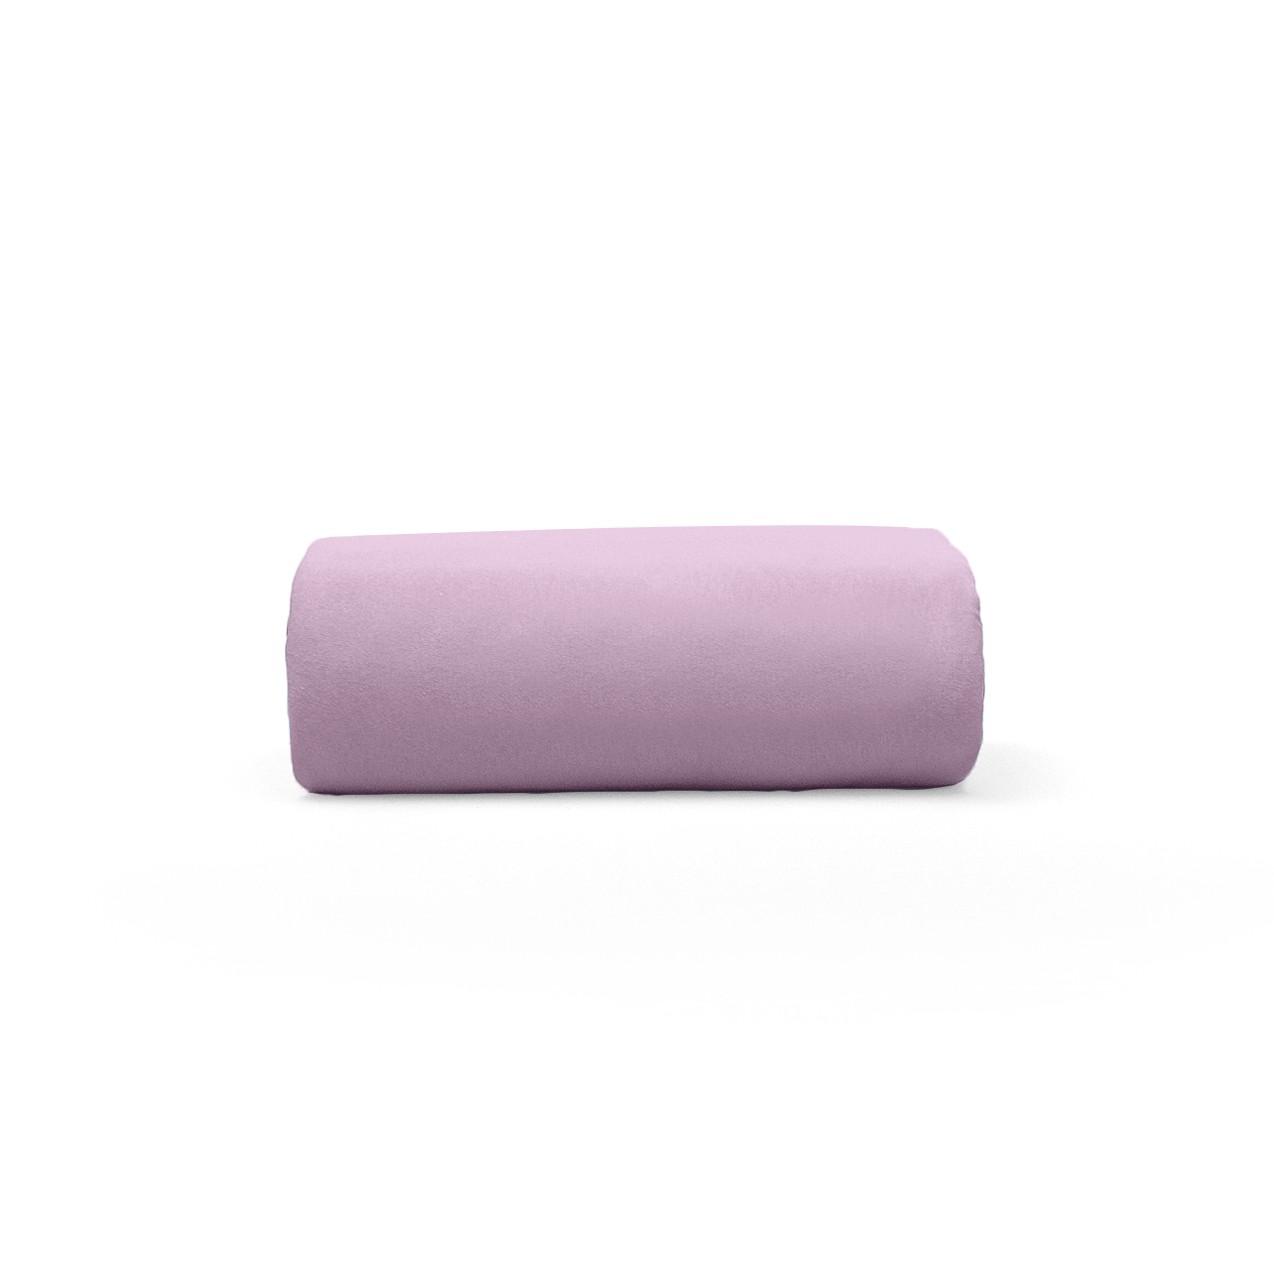 Lencol Malha Casal Art Premium com Elastico 100 algodao Rosa - Buettner